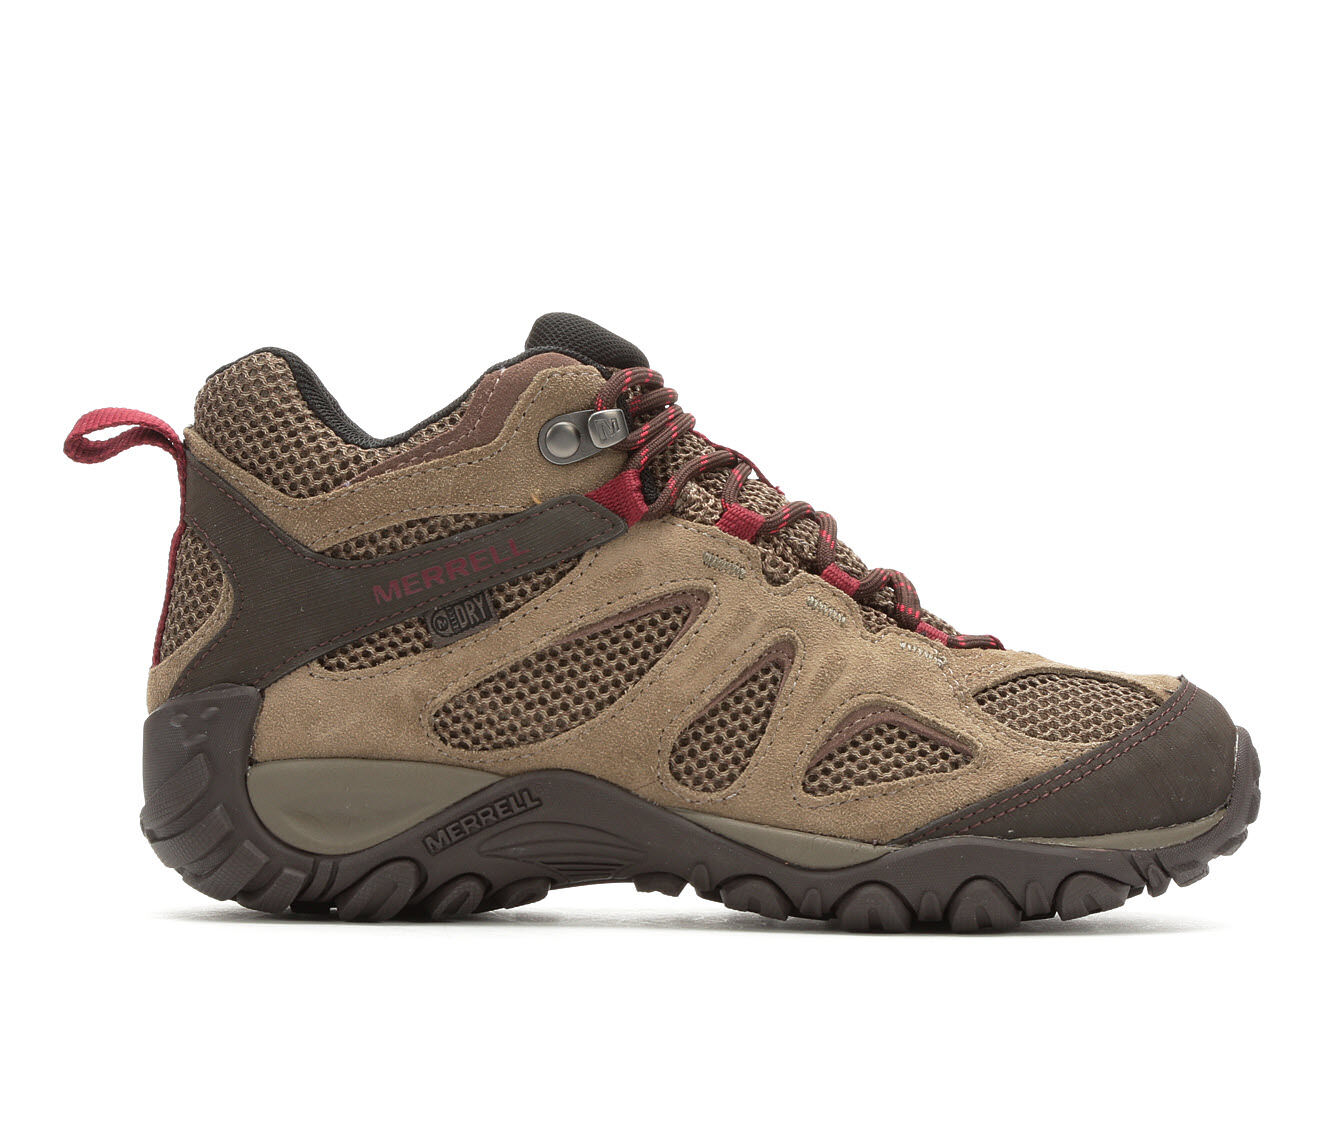 Women's Merrell Yokota 2 MID Waterproof Hiking Boots Brindle